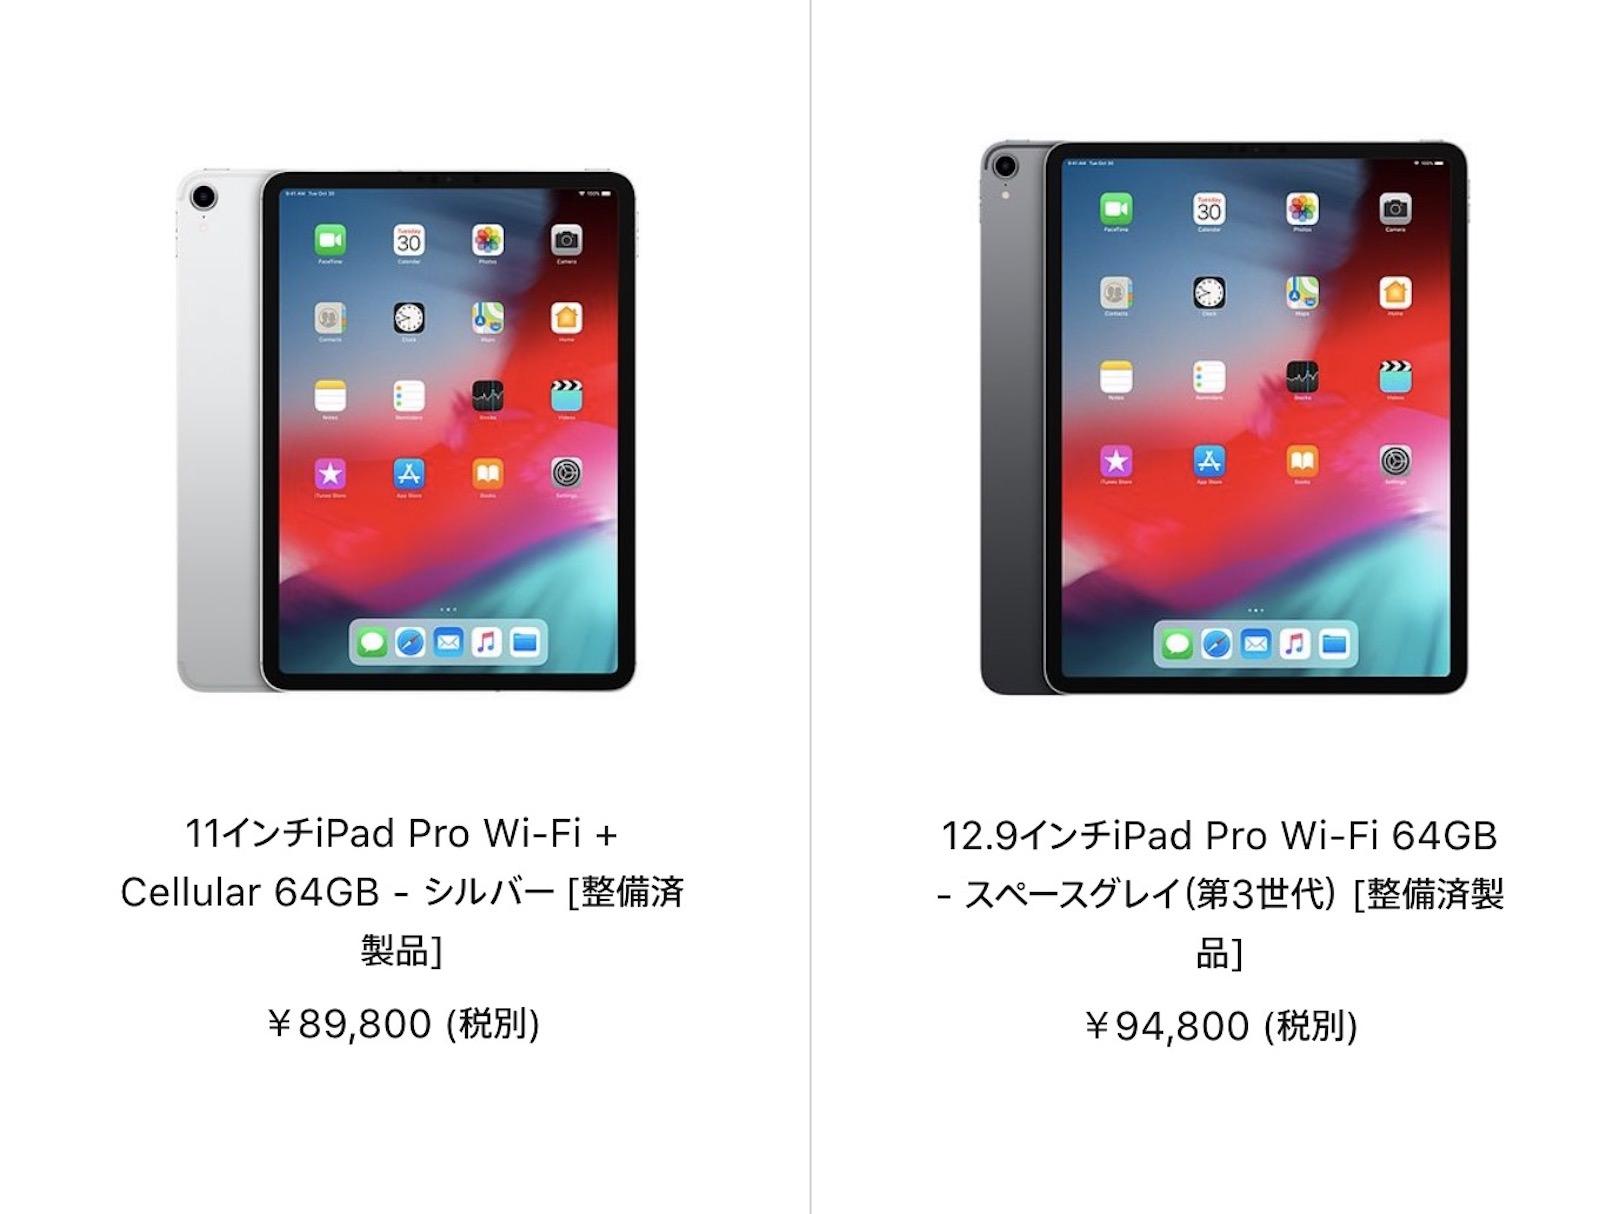 Apple Store Refurbished models (JAPAN)